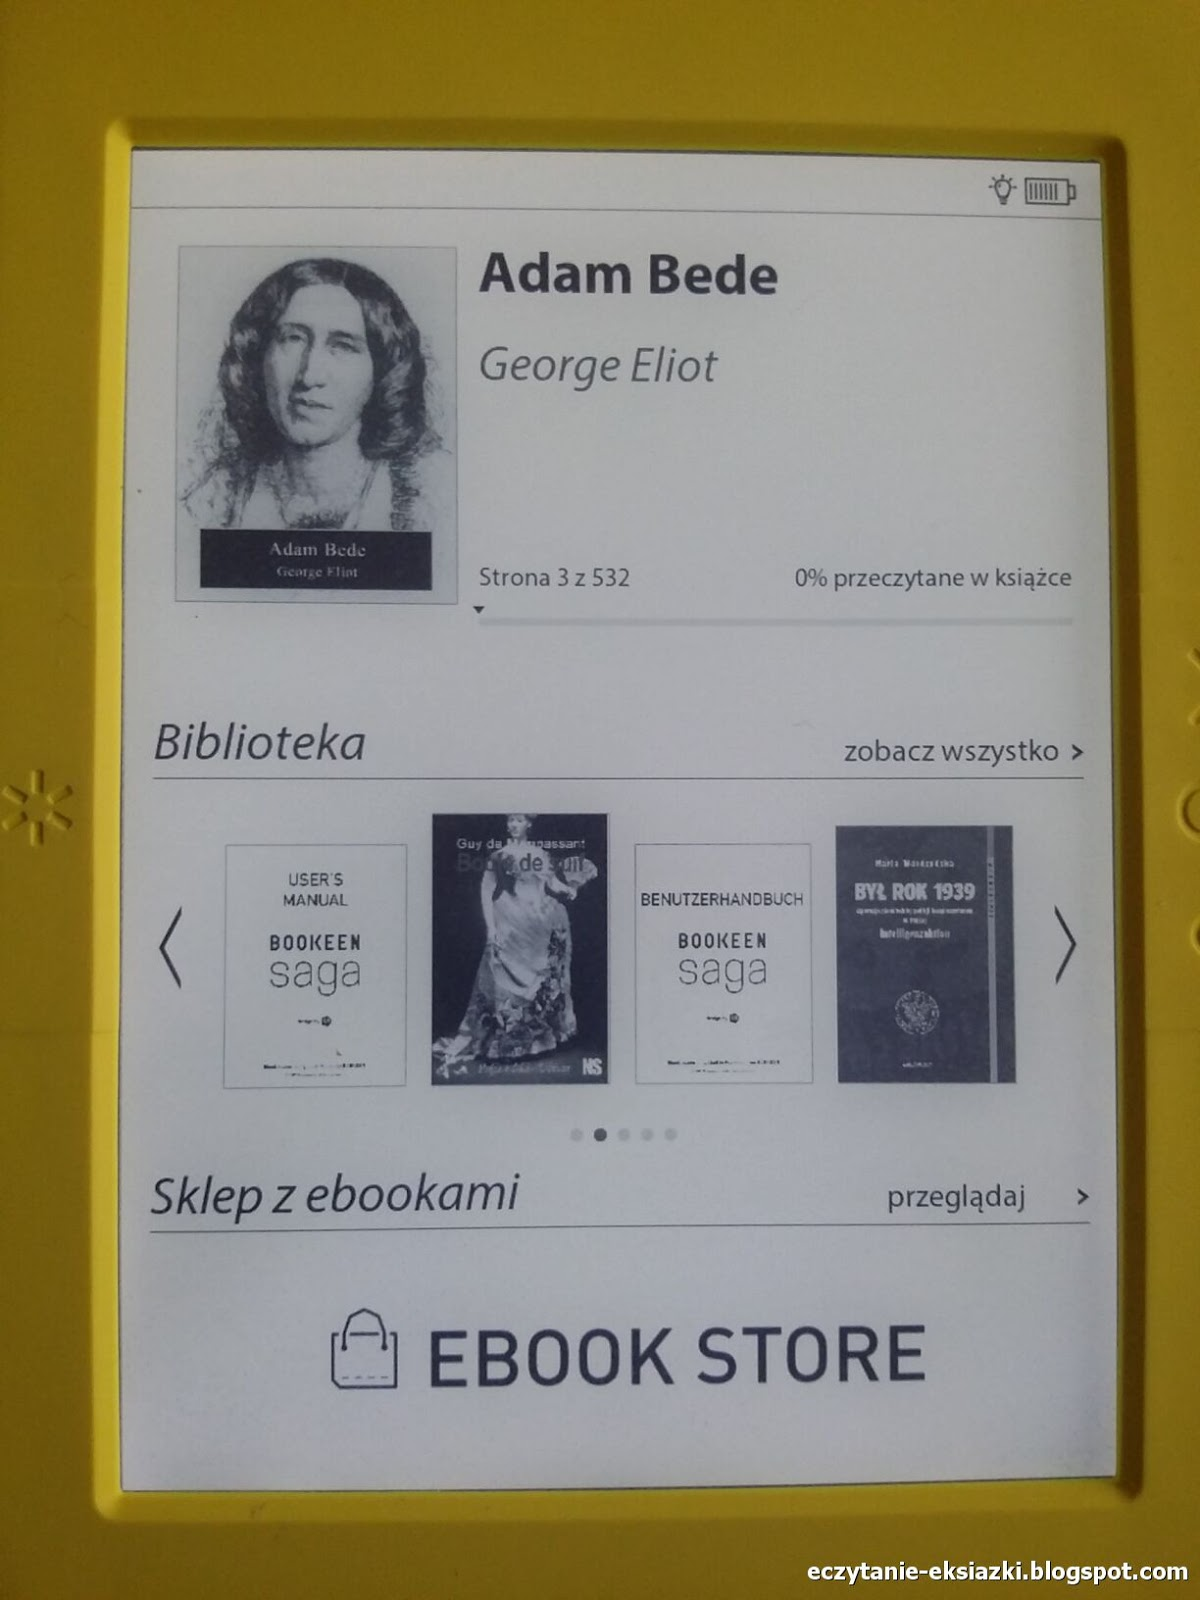 Ekran startowy czytnika Bookeen Saga